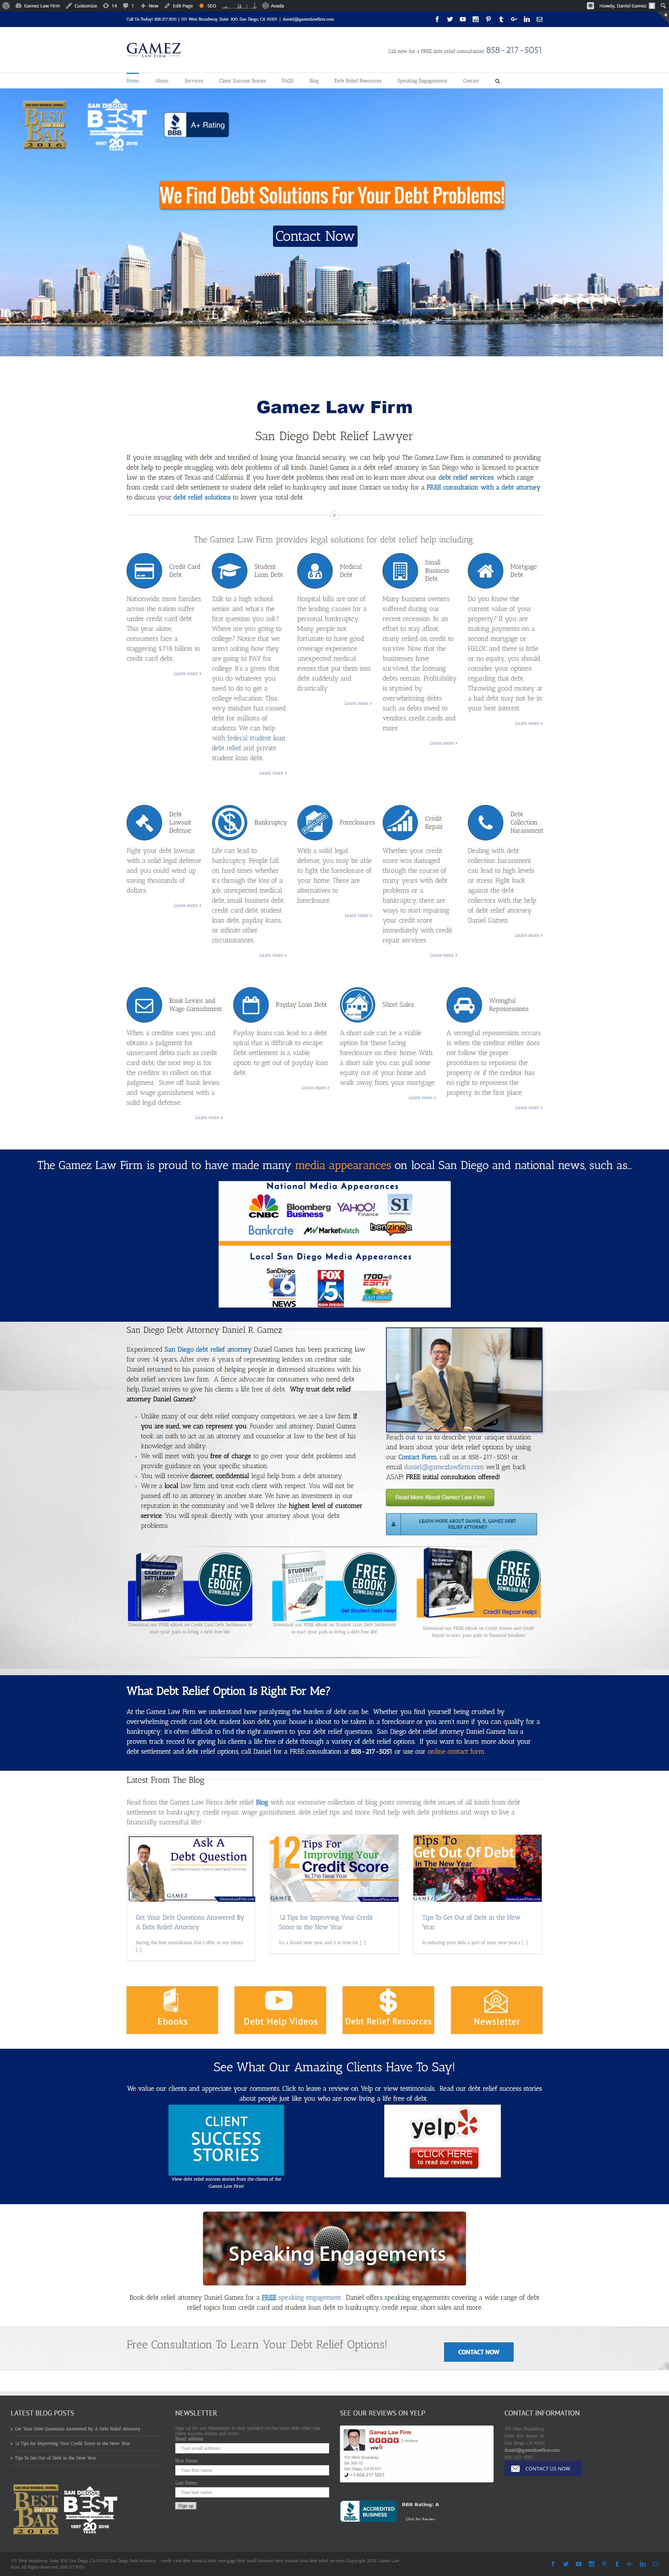 San Diego Debt Relief Law Firm Gamez Law Firm Website Design Homepage Law Firm Website Design Law Firm Website Digital Marketing Services